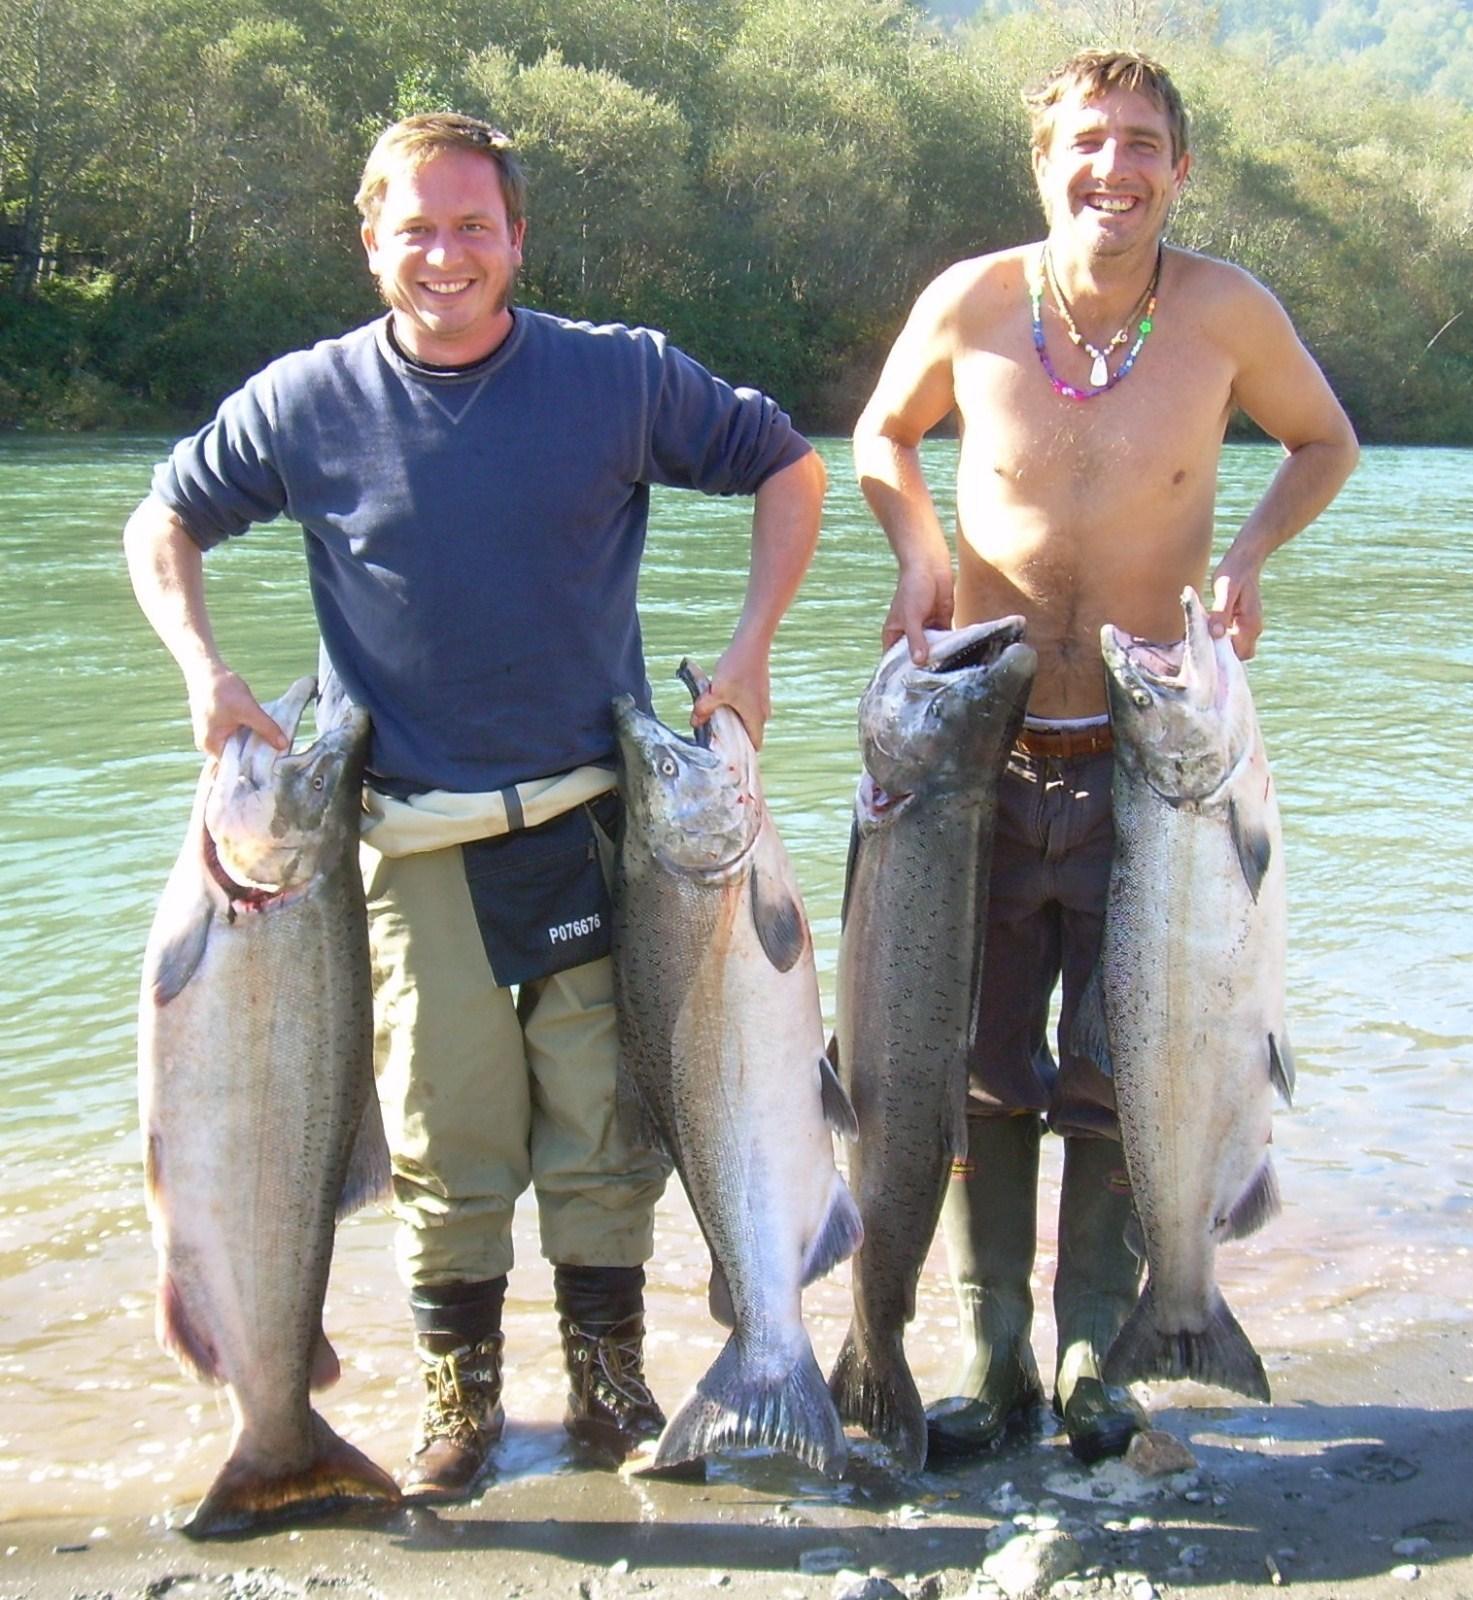 Harold Hanson Fishing: ELK SIXES AND CHETCO TRIP